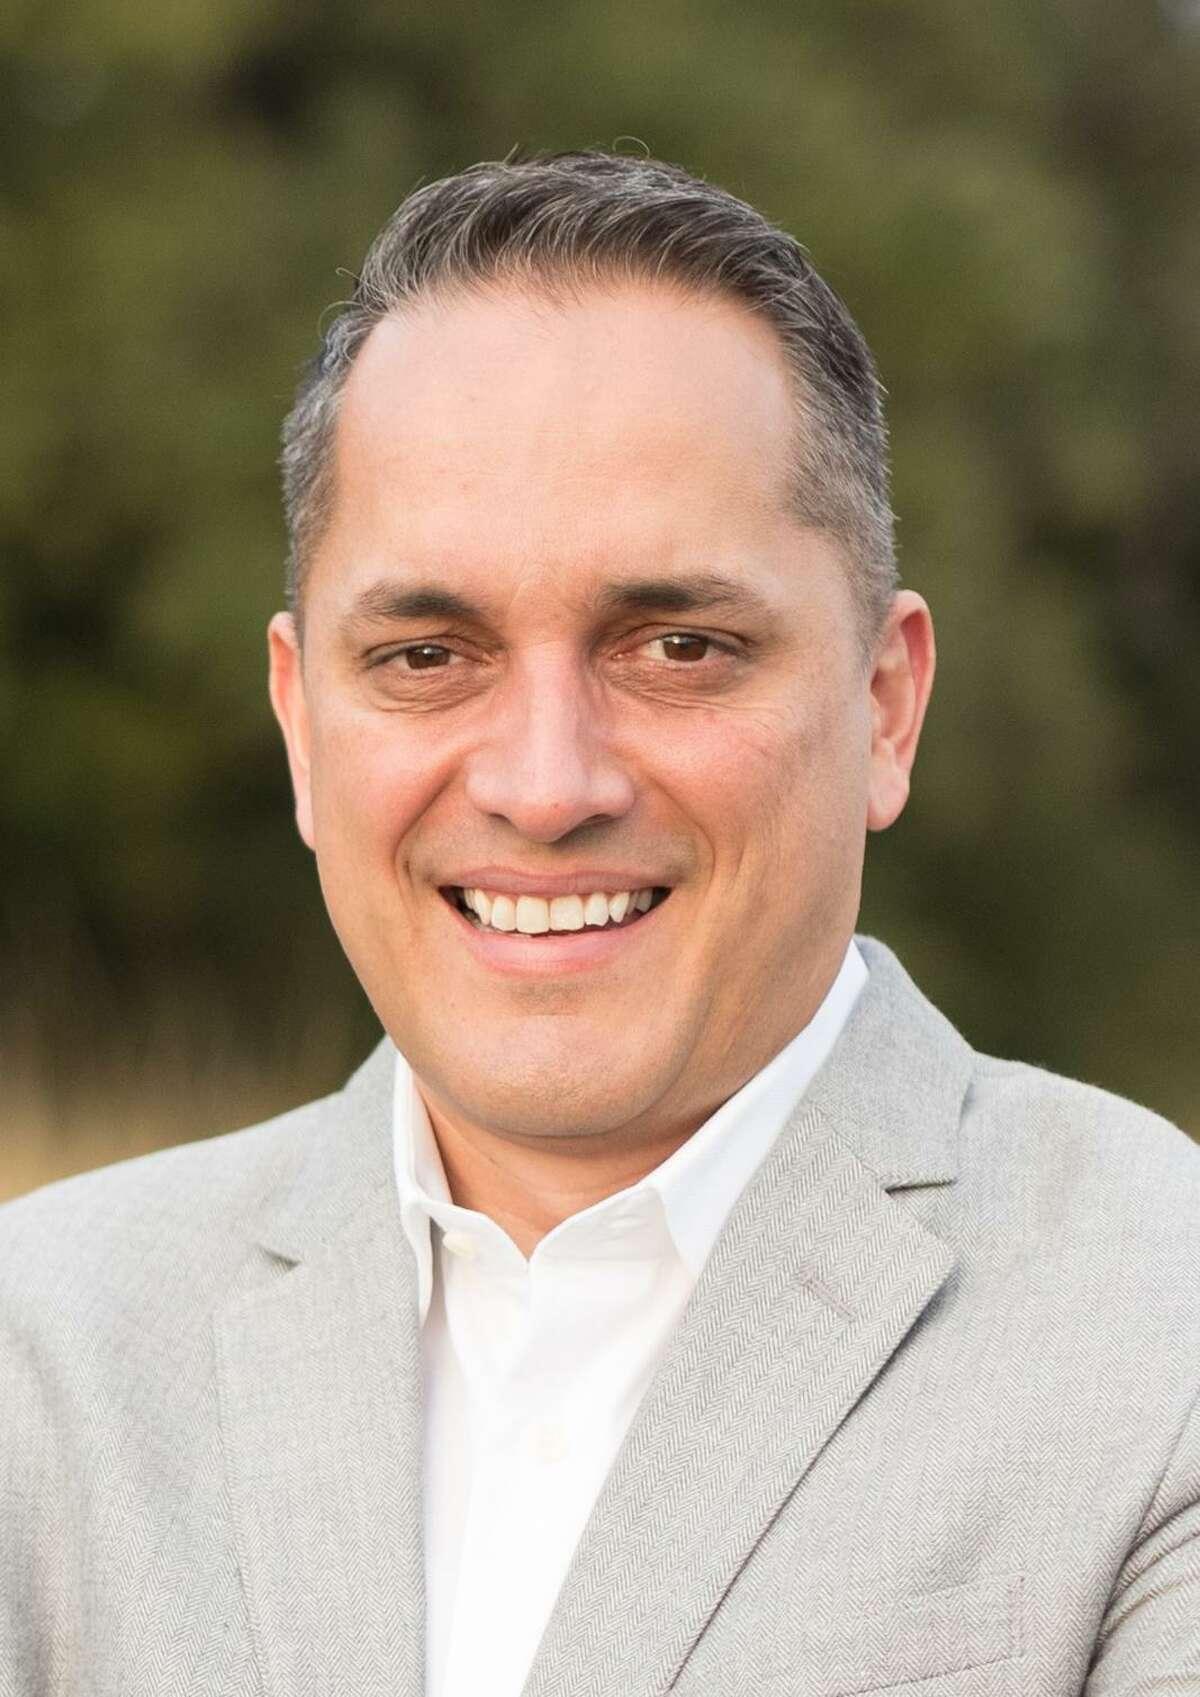 Greg Brockhouse is running for mayor